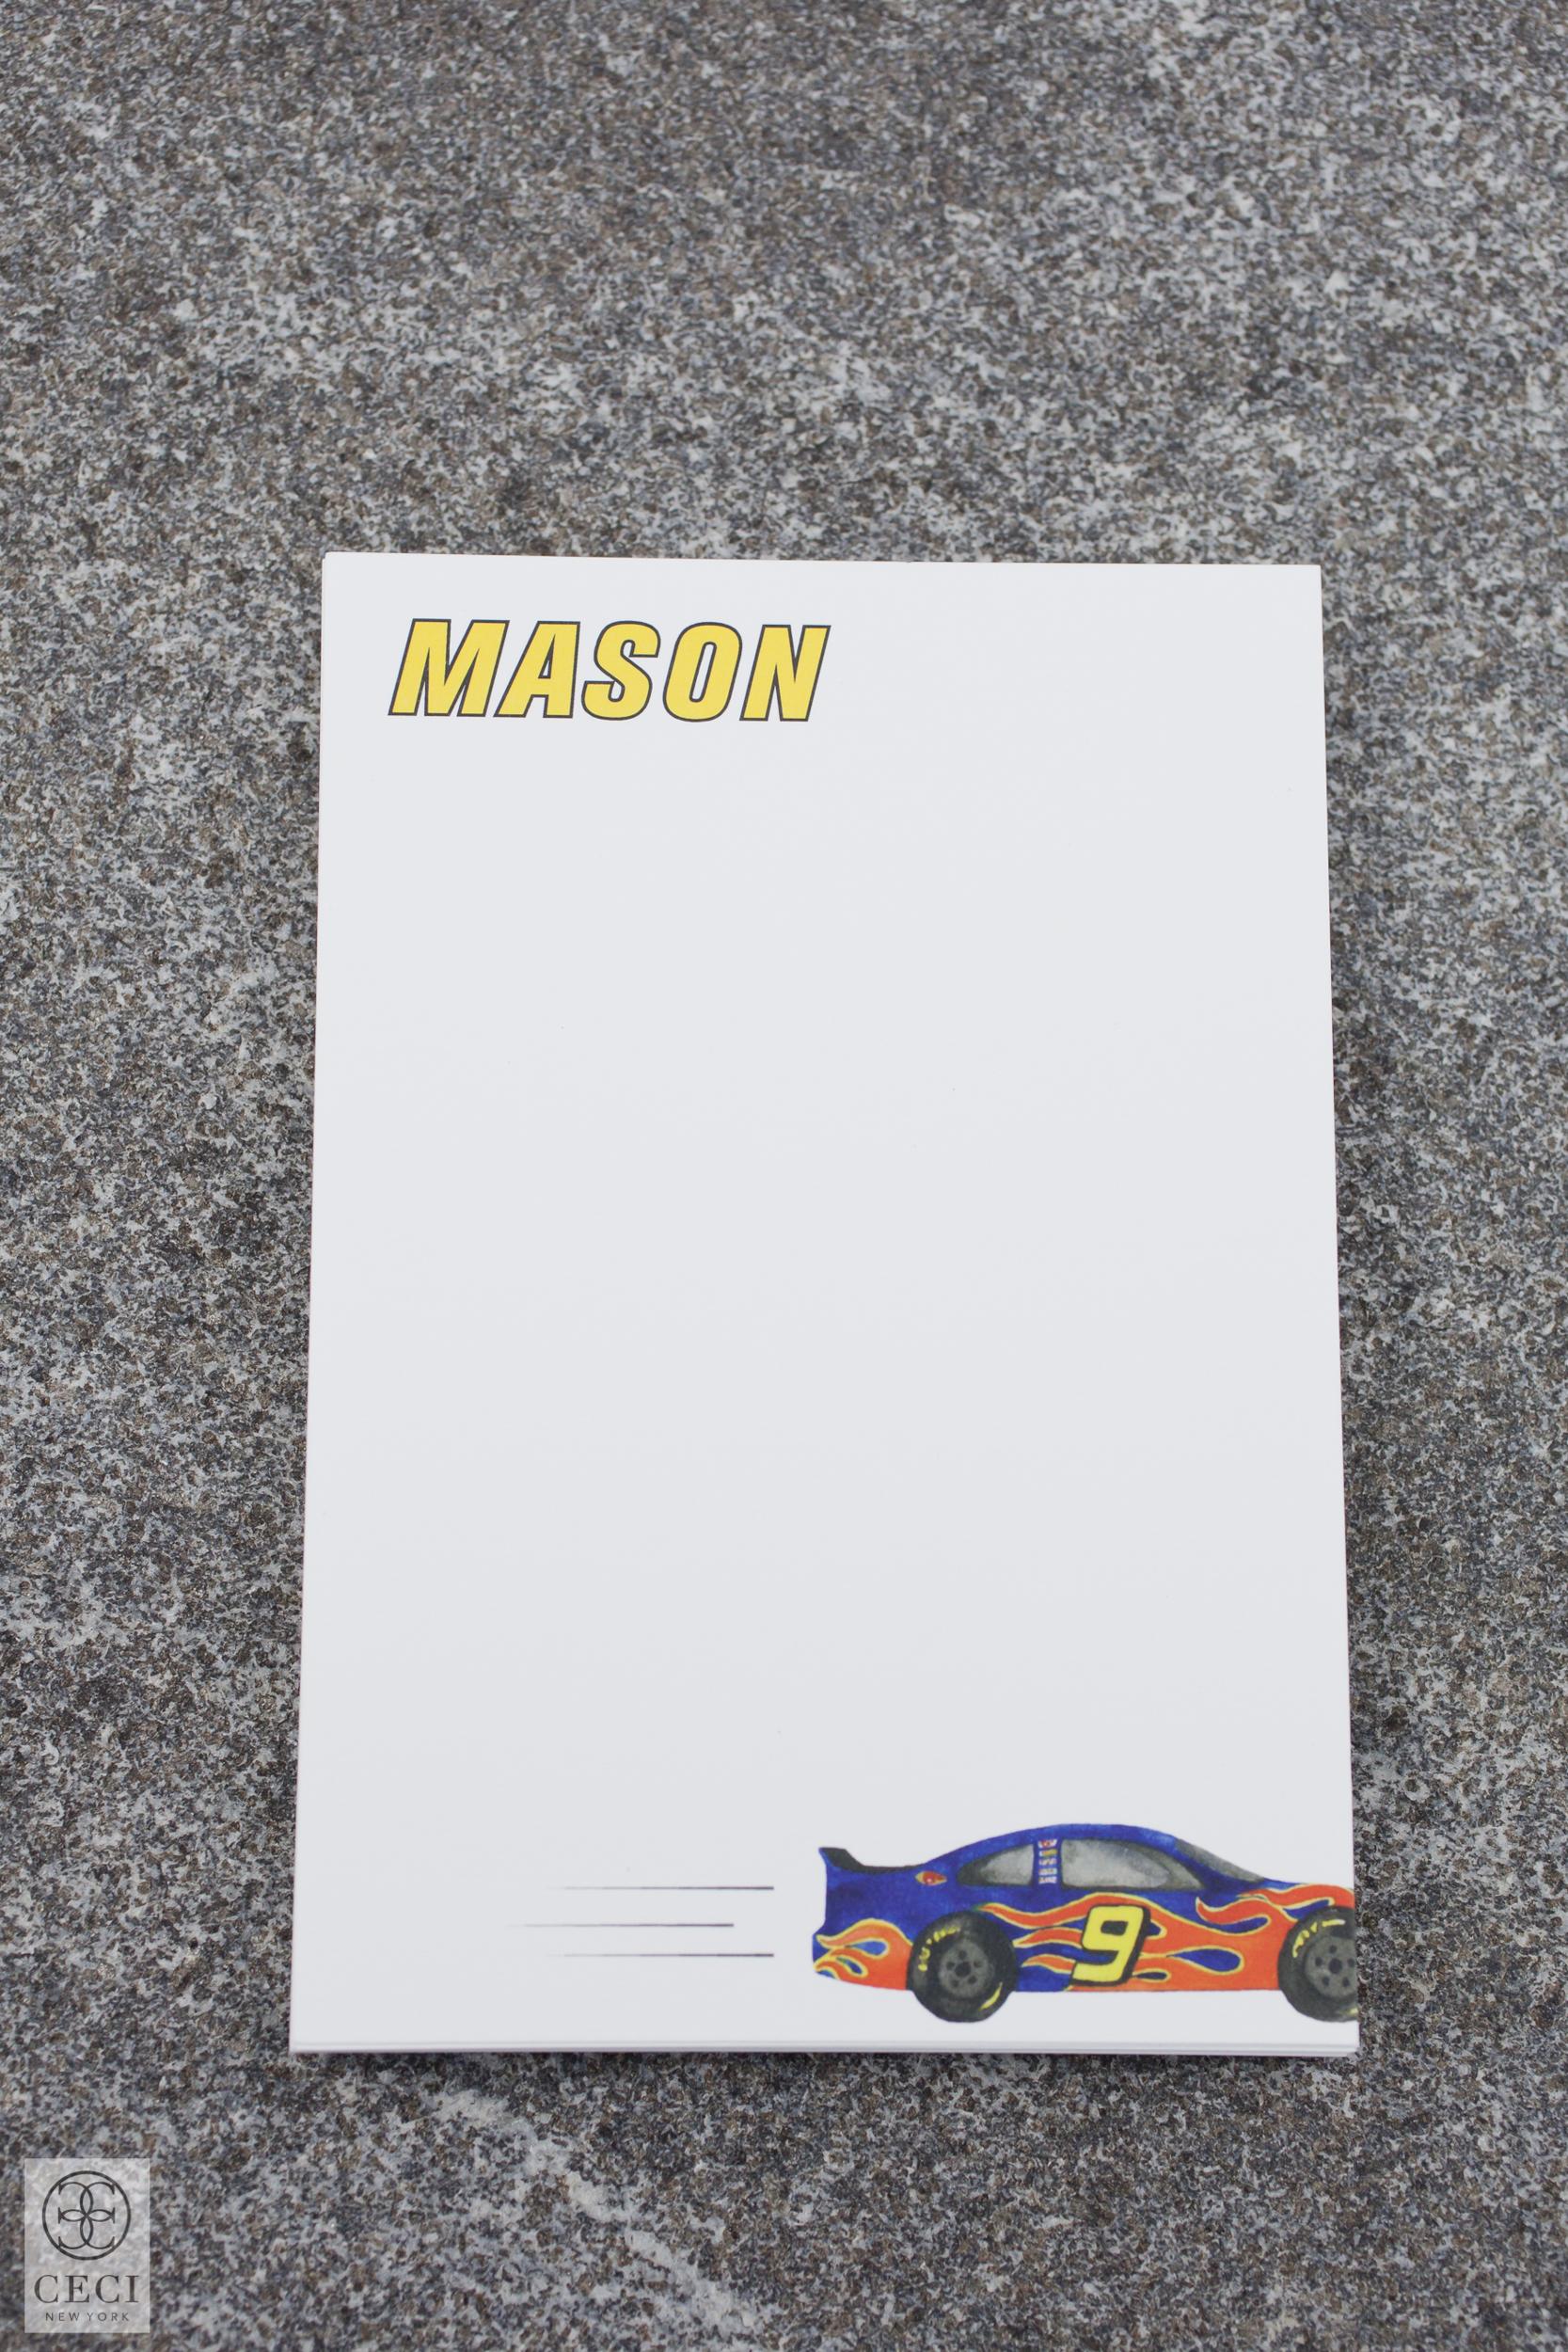 ceci_new_york_mason_ceci_johnson_race_car_birthday_party-8.jpg